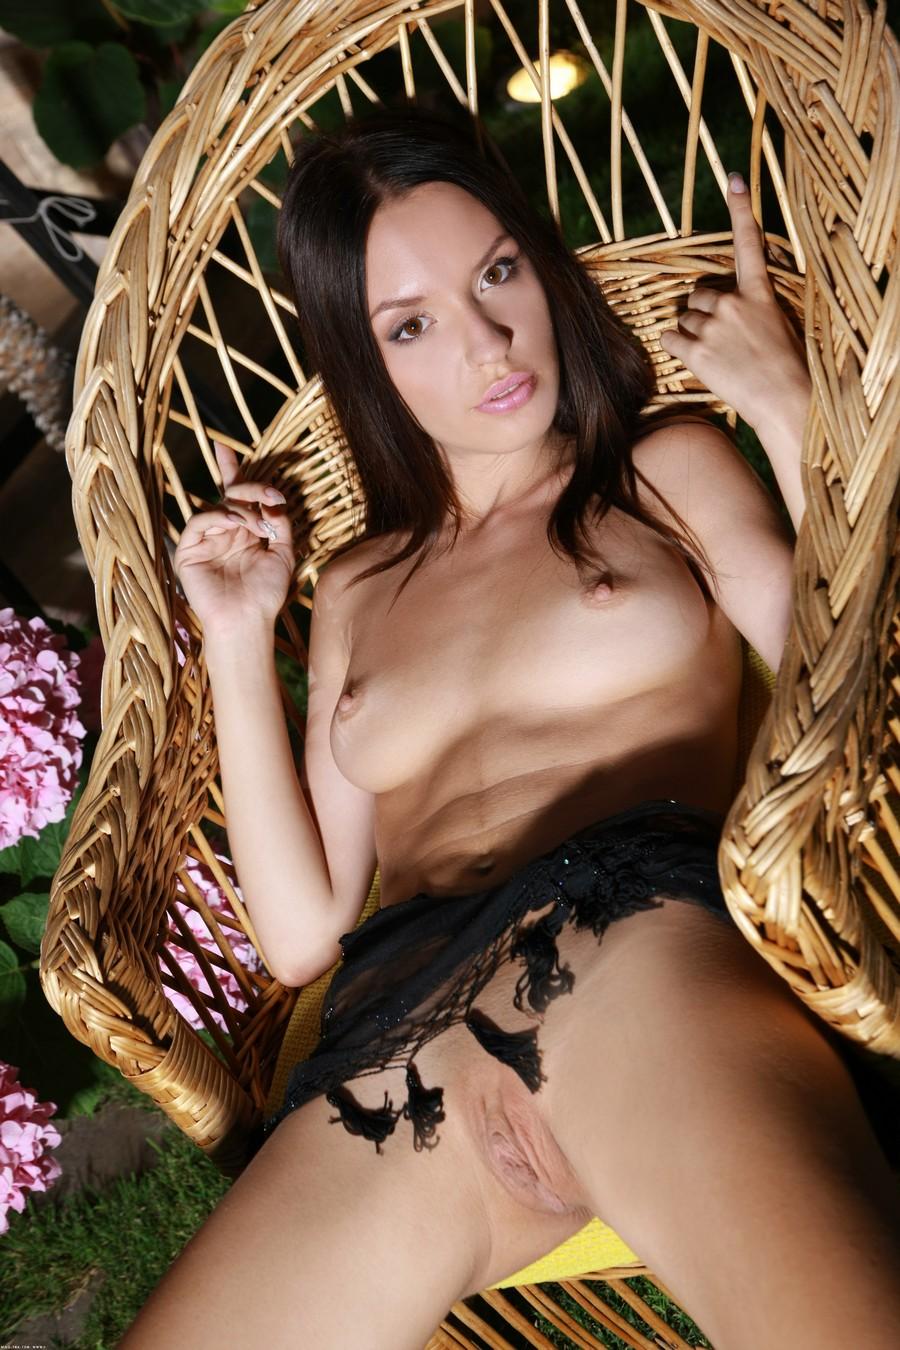 erotic pics tantrisk massasje norge